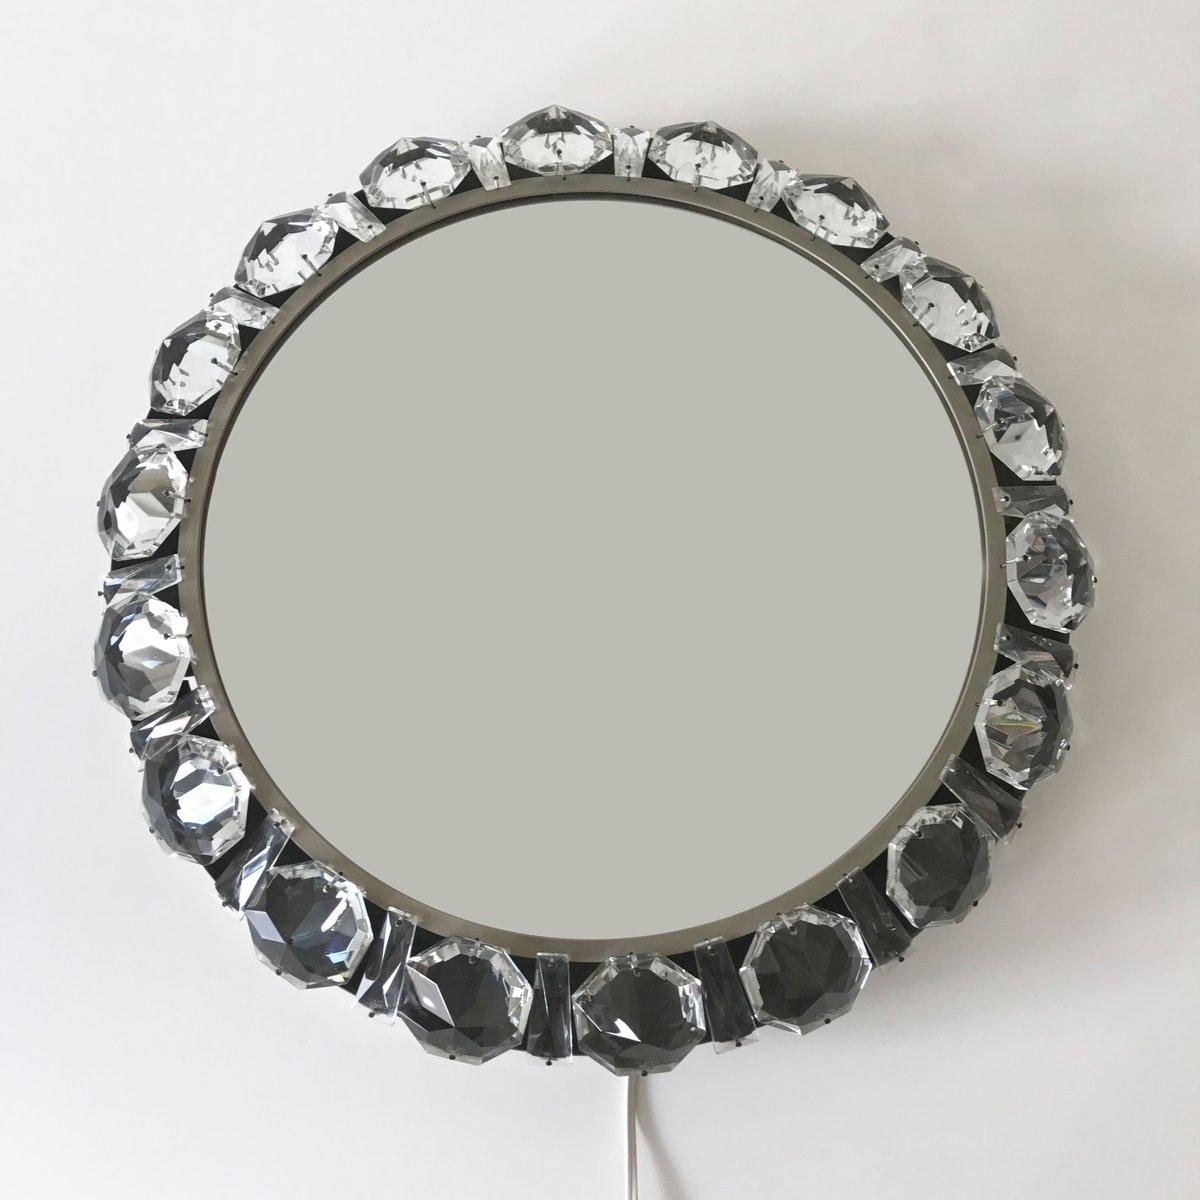 Mid Century Modern Illuminated Crystal Wall Mirror. Mid Century Modern Illuminated Crystal Wall Mirror for sale at Pamono